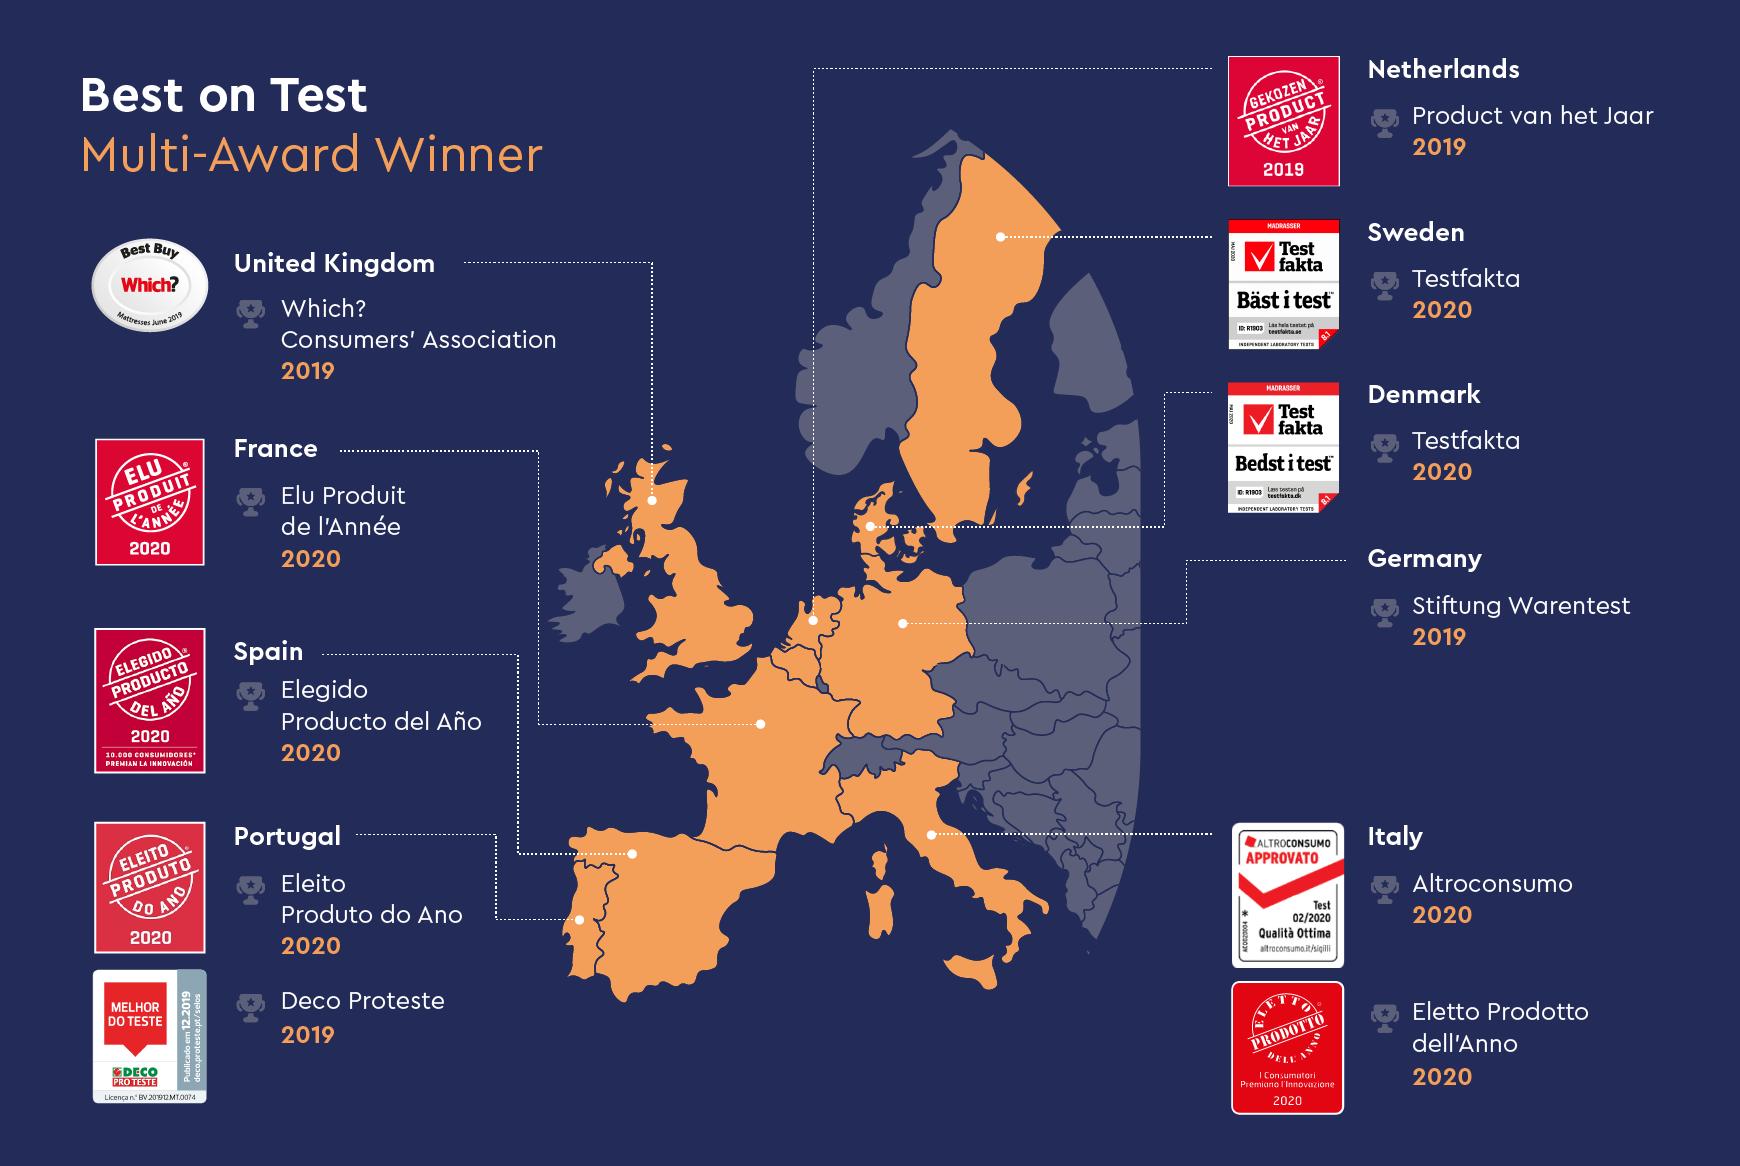 Best Europe's Mattress - as Multi-Award Winner over the World!